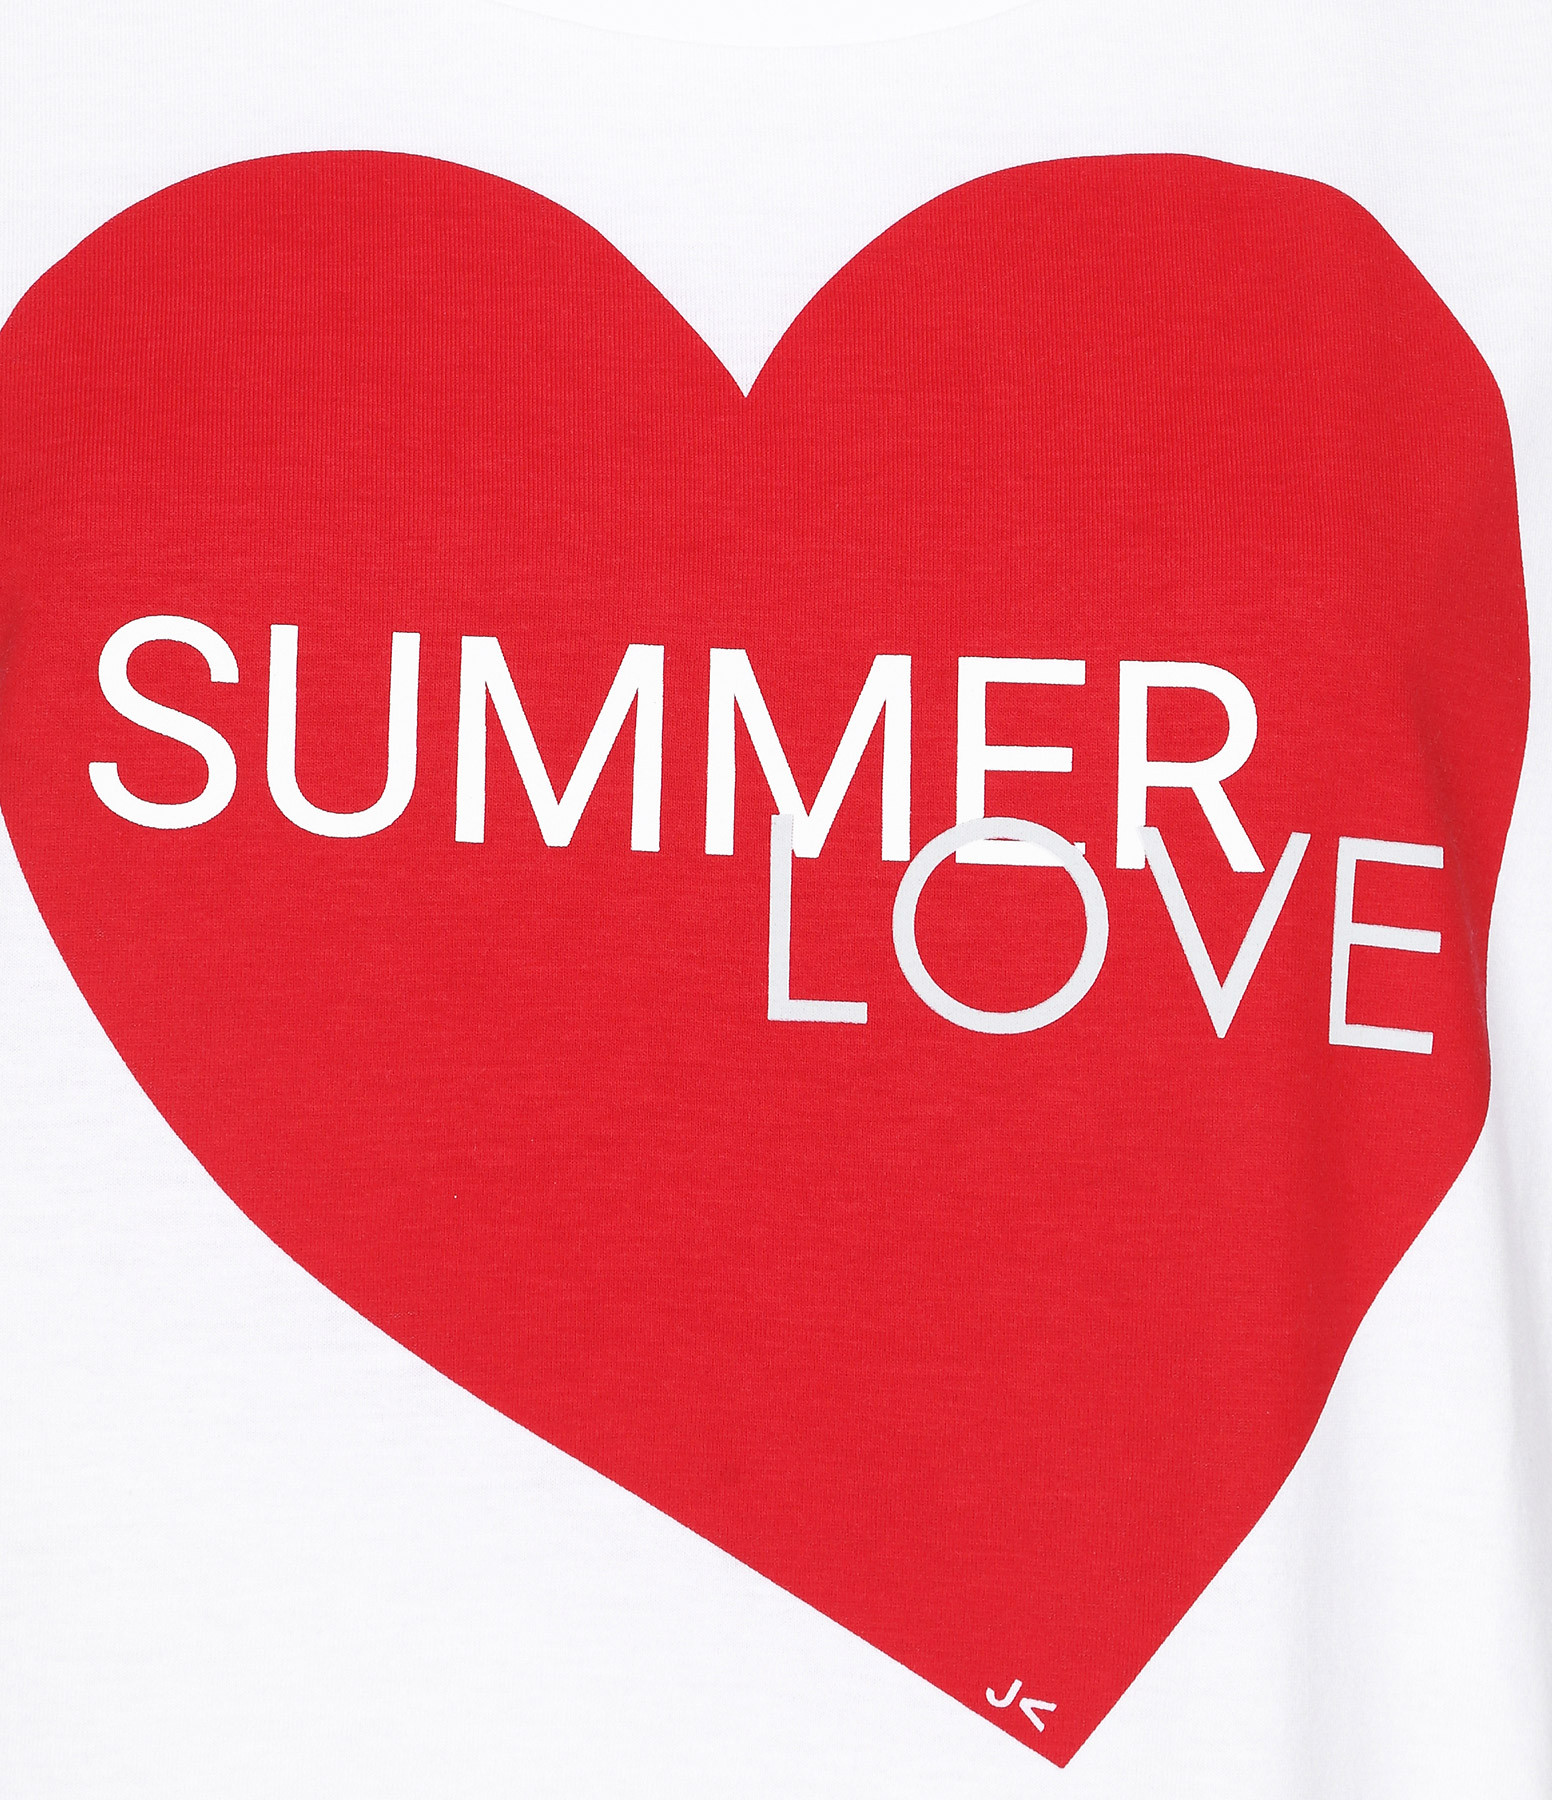 JEANNE VOULAND - Tee-shirt Bob Summer Love Blanc Imprimé Rouge